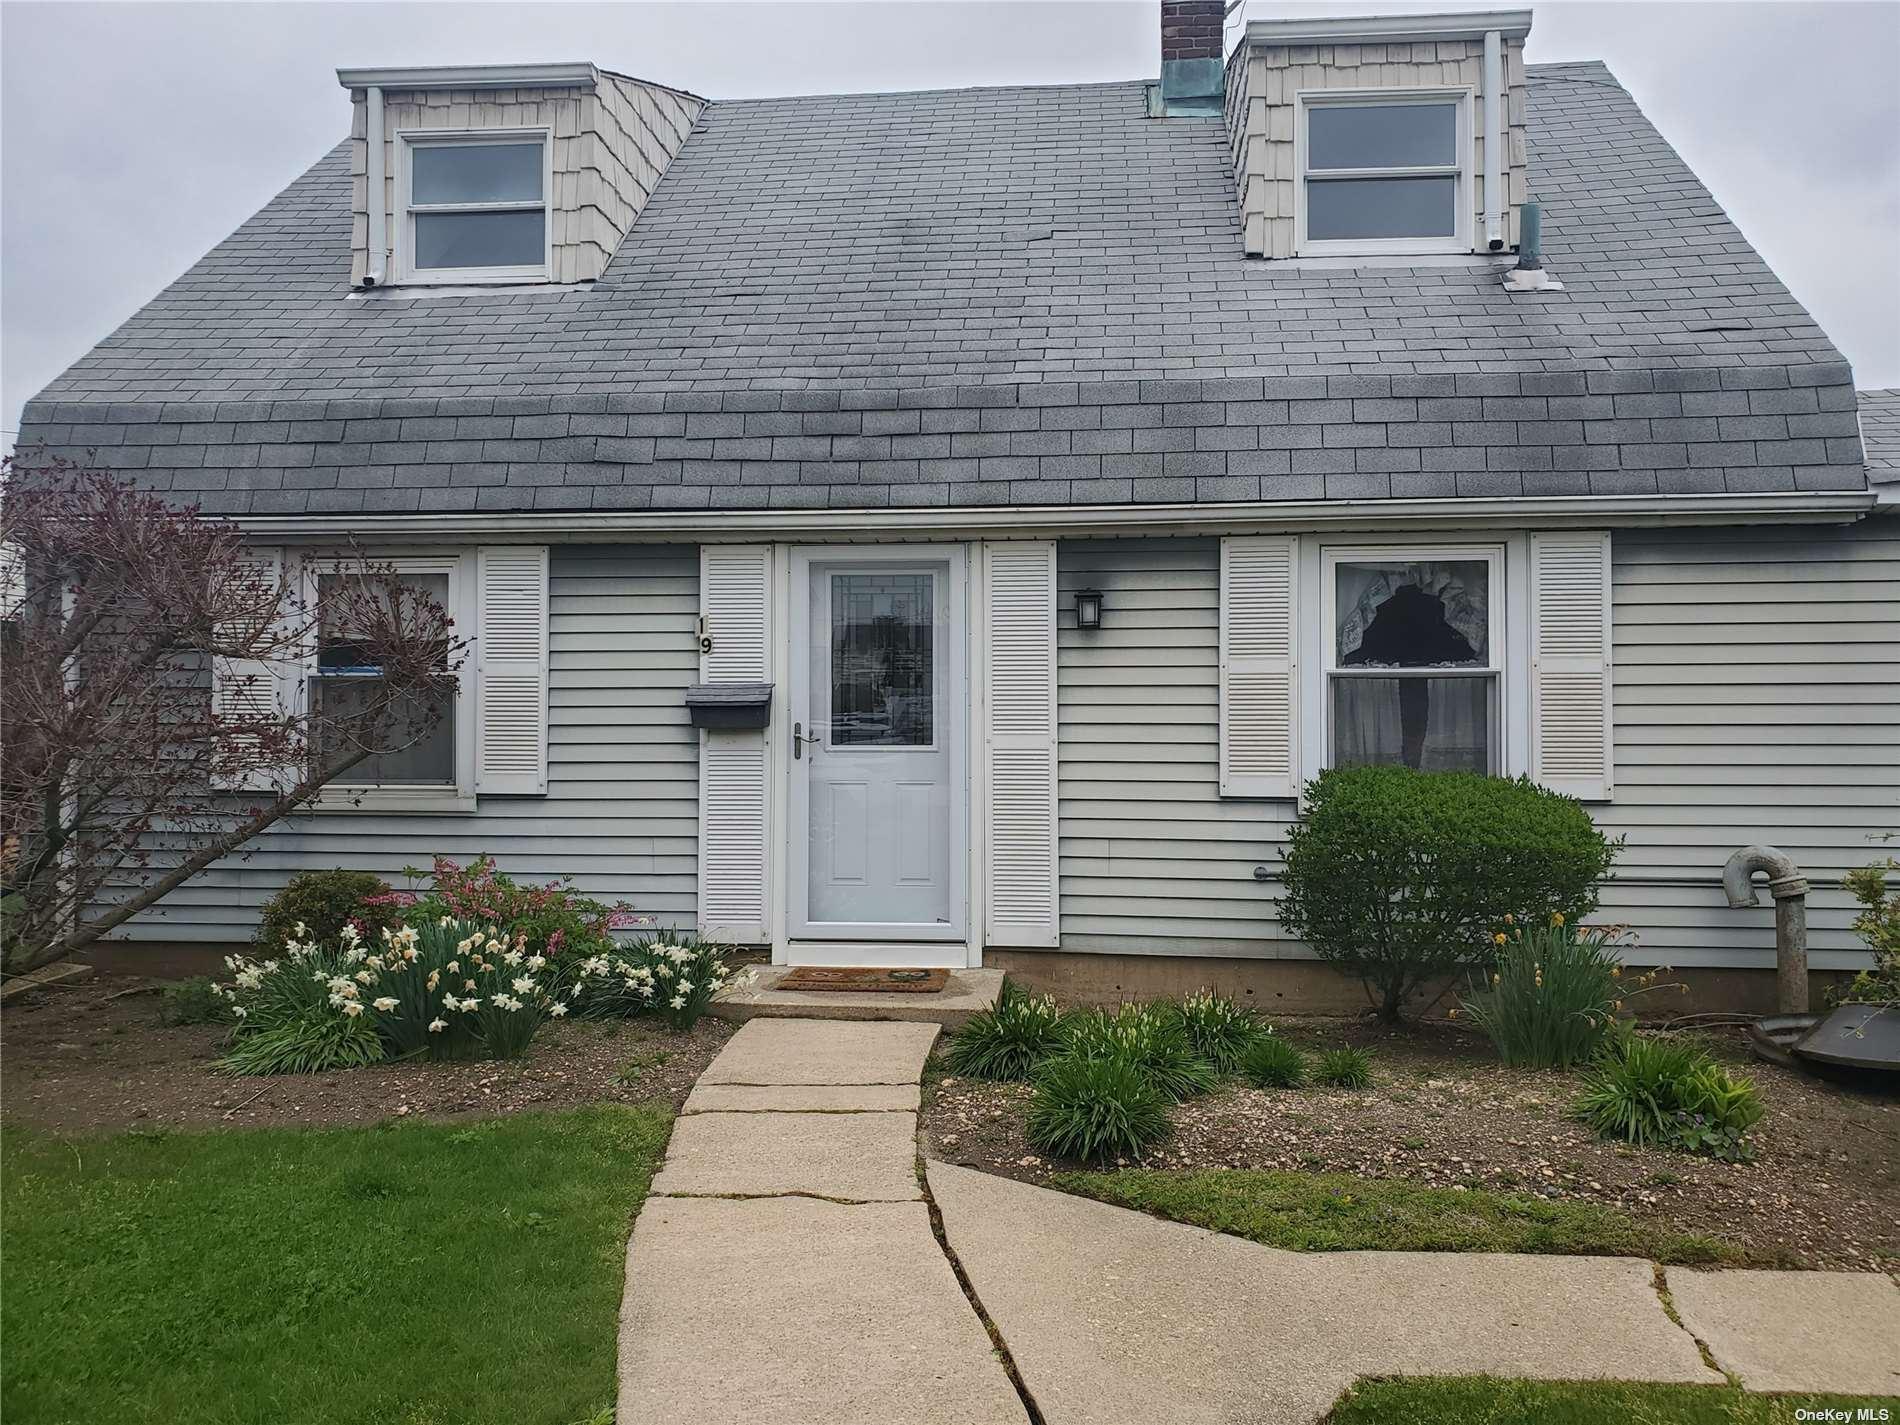 19 Crabtree Lane, Levittown, NY 11756 - MLS#: 3306704